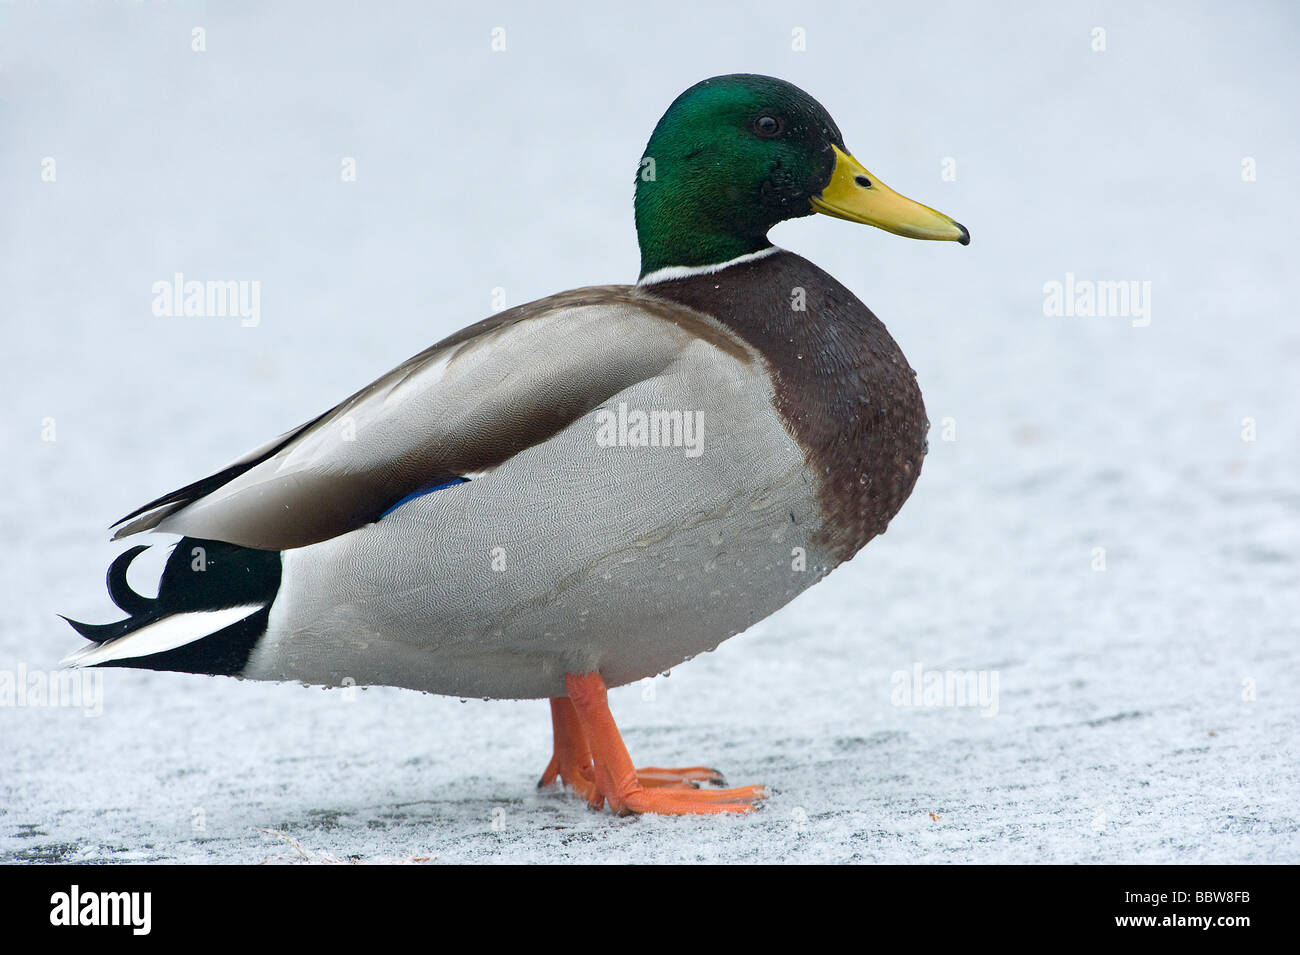 Mallard Anas platyrhynchos drake on snow covered frozen lake - Stock Image